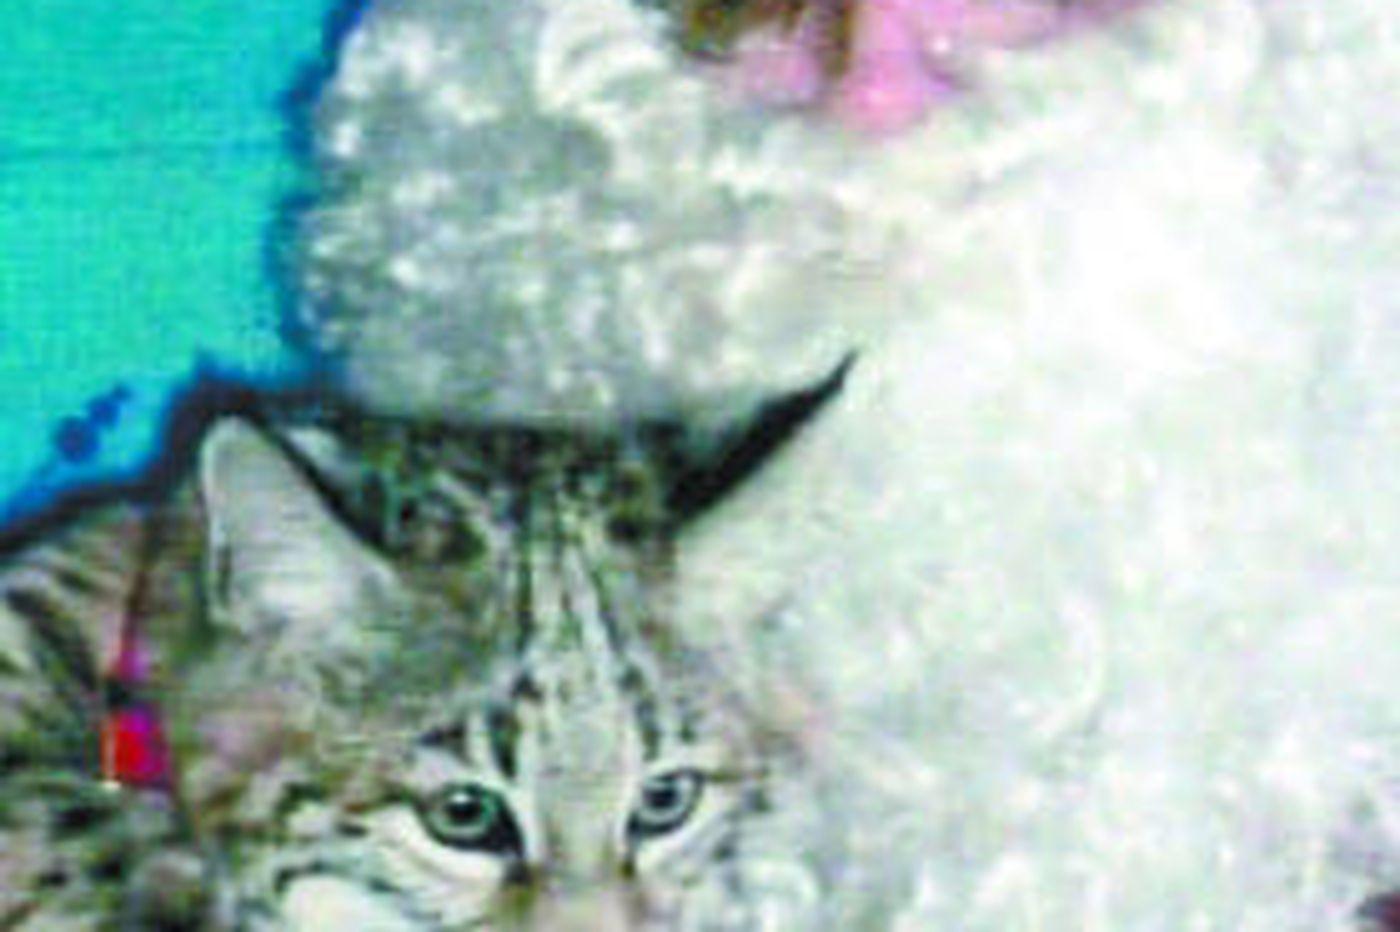 Cat that bit Atlantic County 'Santa' wasn't a bobcat